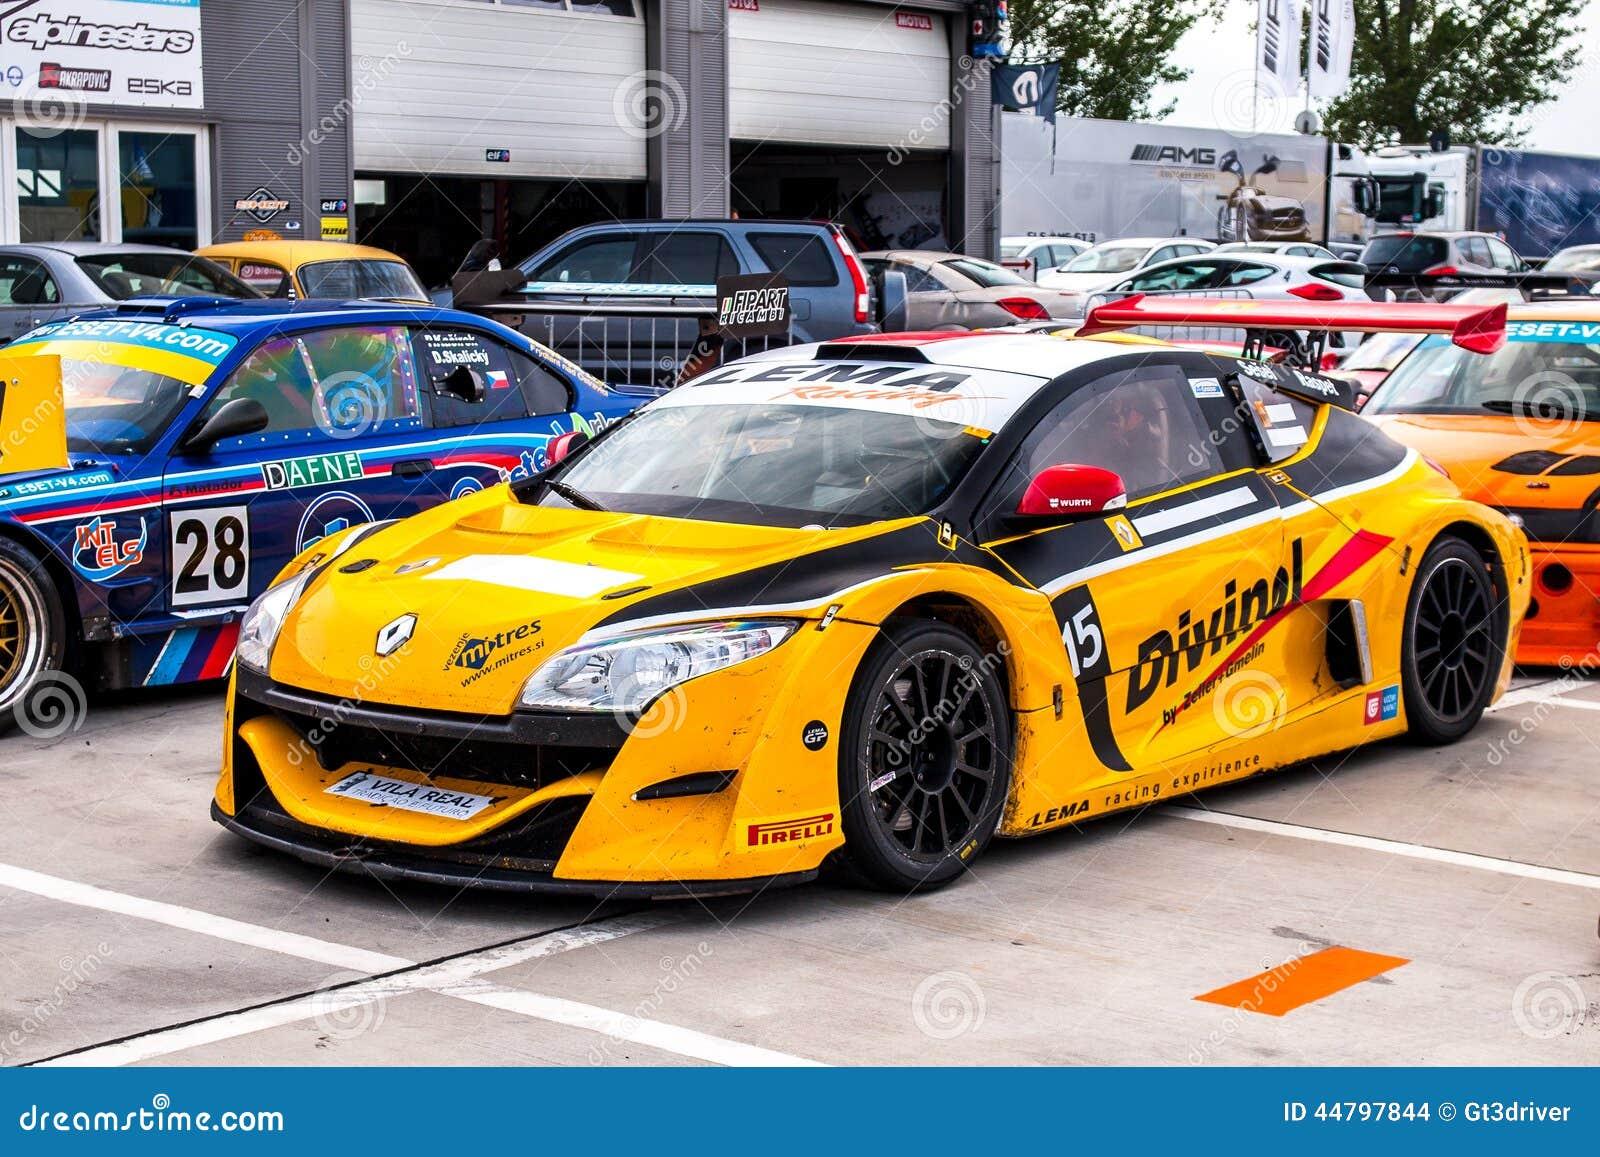 Race Car Trophy >> Renault Megane Trophy Editorial Stock Image - Image: 44797844